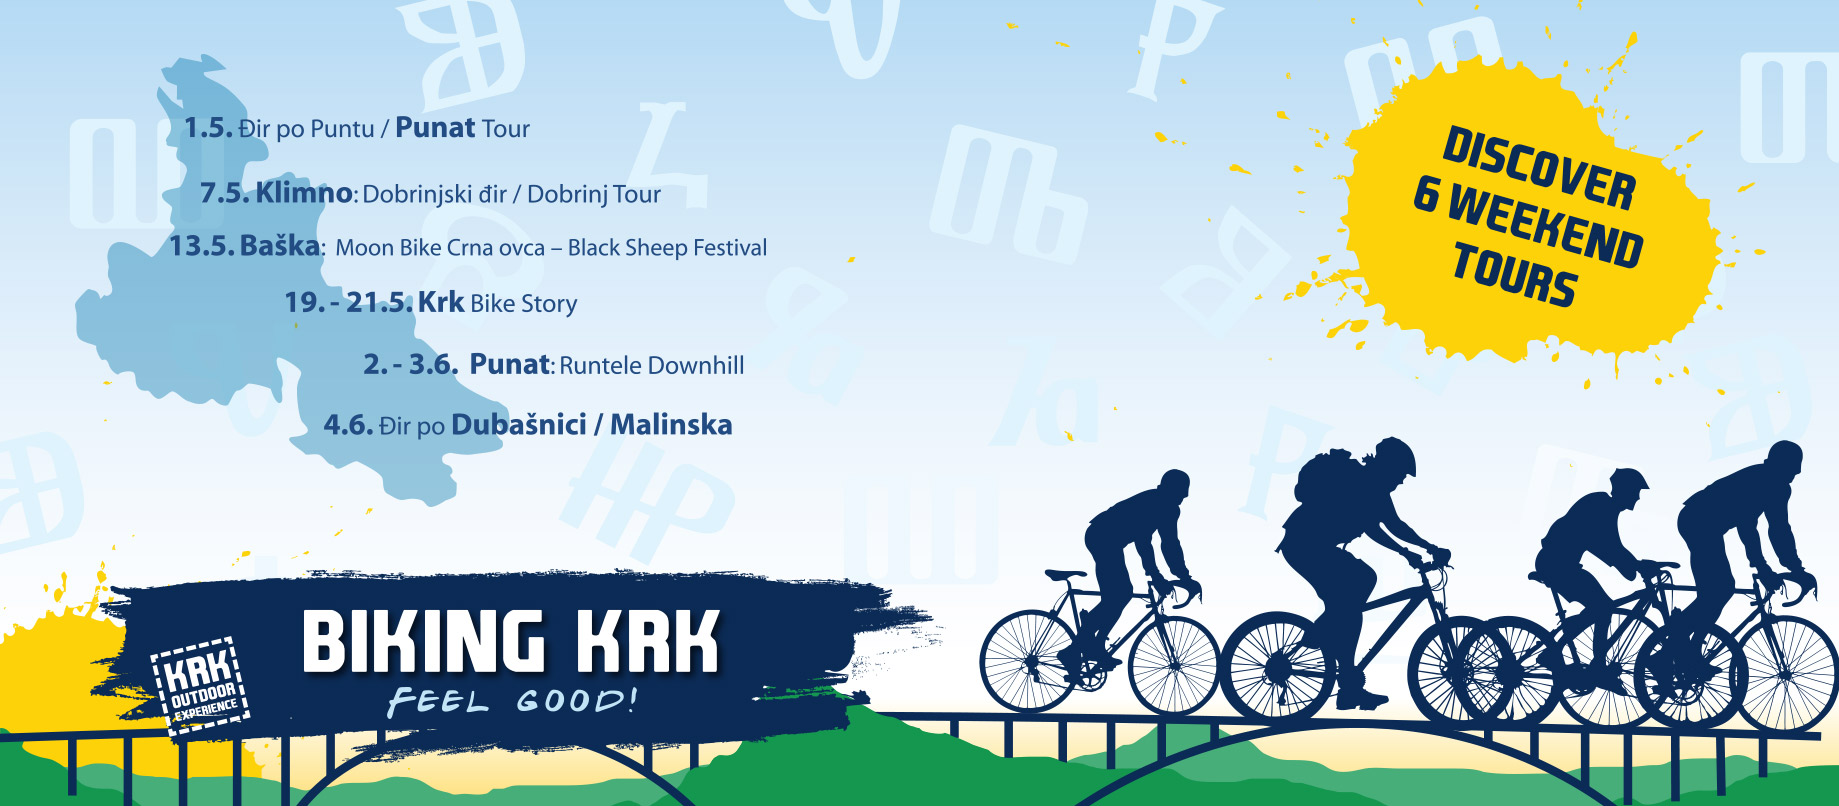 Biking Krk – Discover Six Weekend Tours